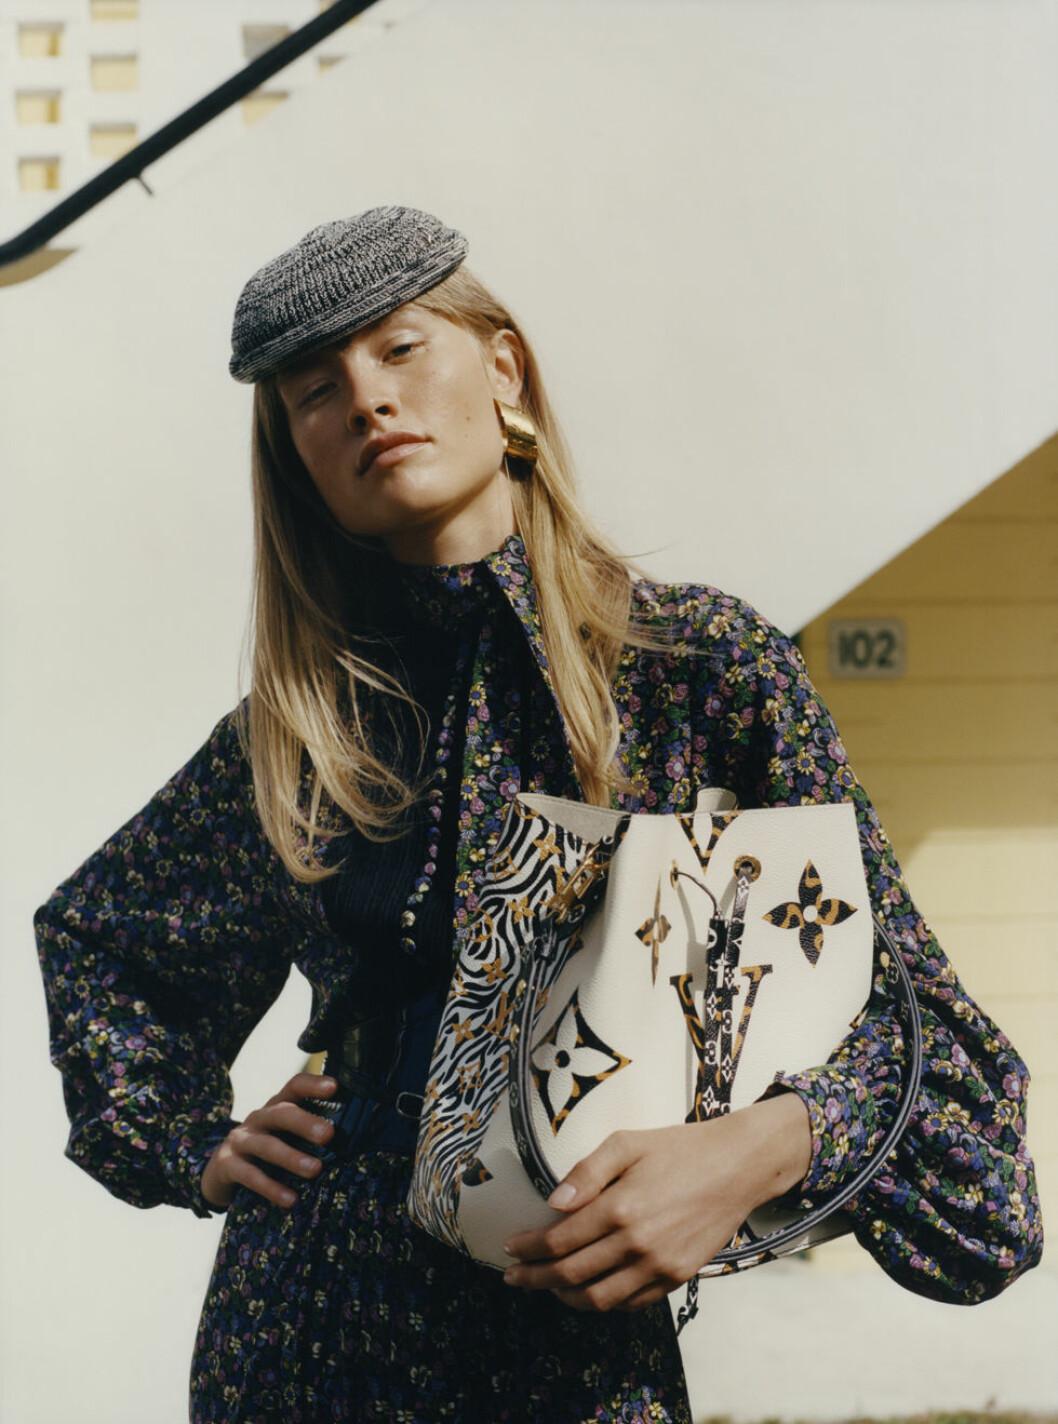 Louis Vuitton Monogram Giant Jungle neo neo bag